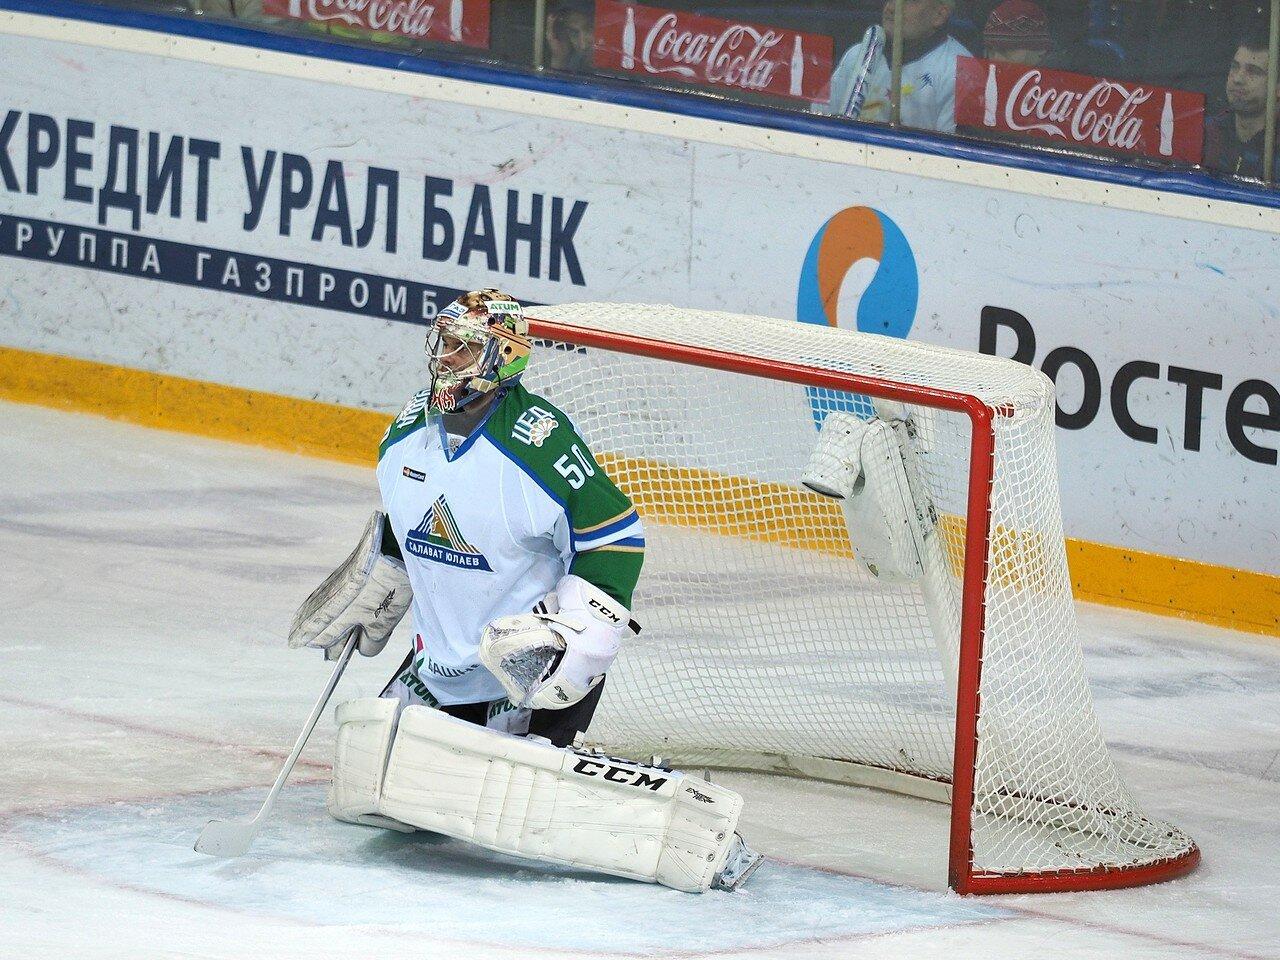 31Плей-офф 2016 Восток Финал Металлург - Салават Юлаев 25.03.2016